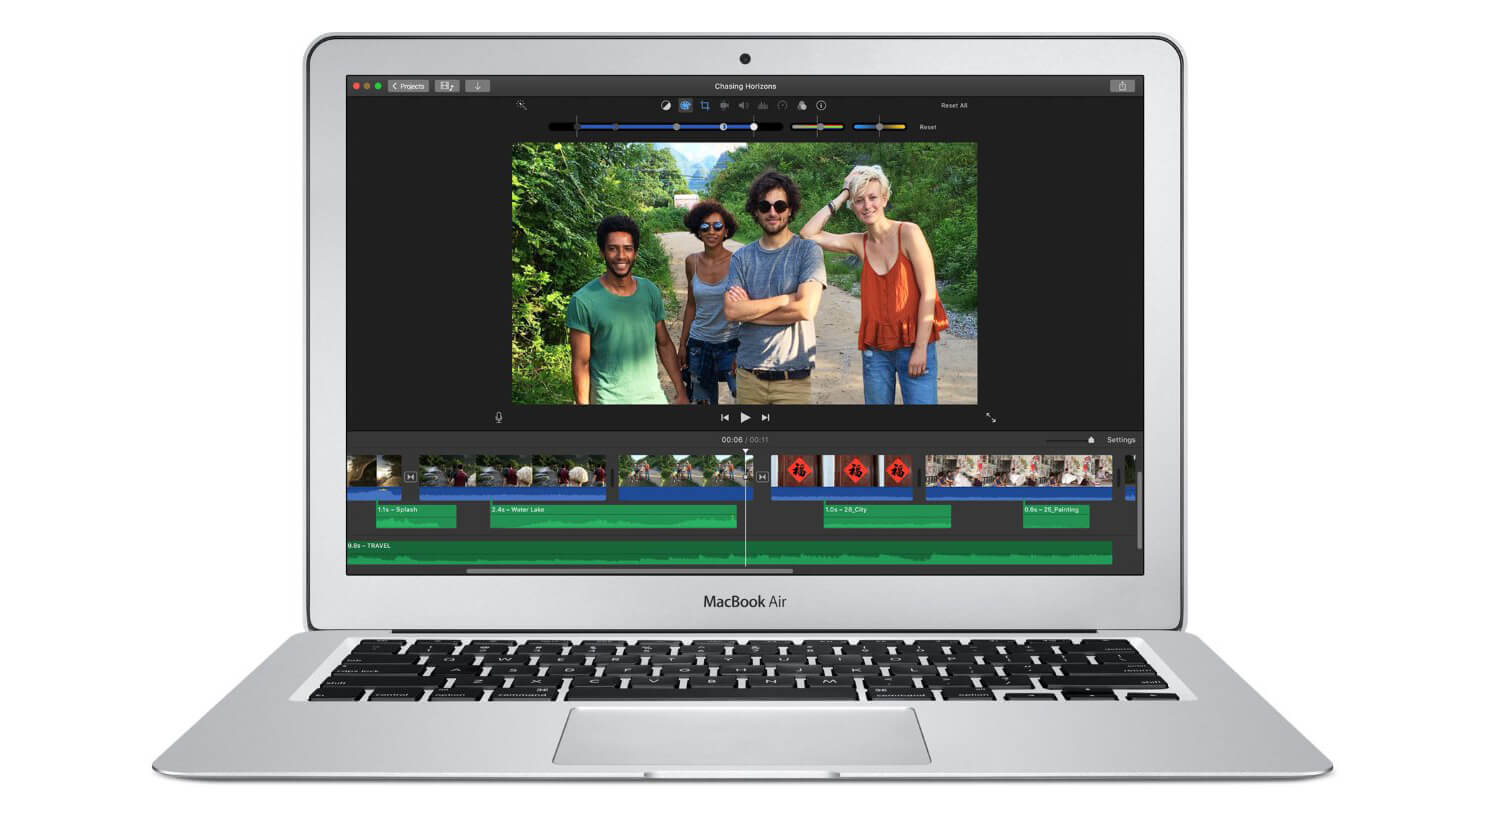 Видеоредактирование на MacBook Air 13 2017 (MQD32)